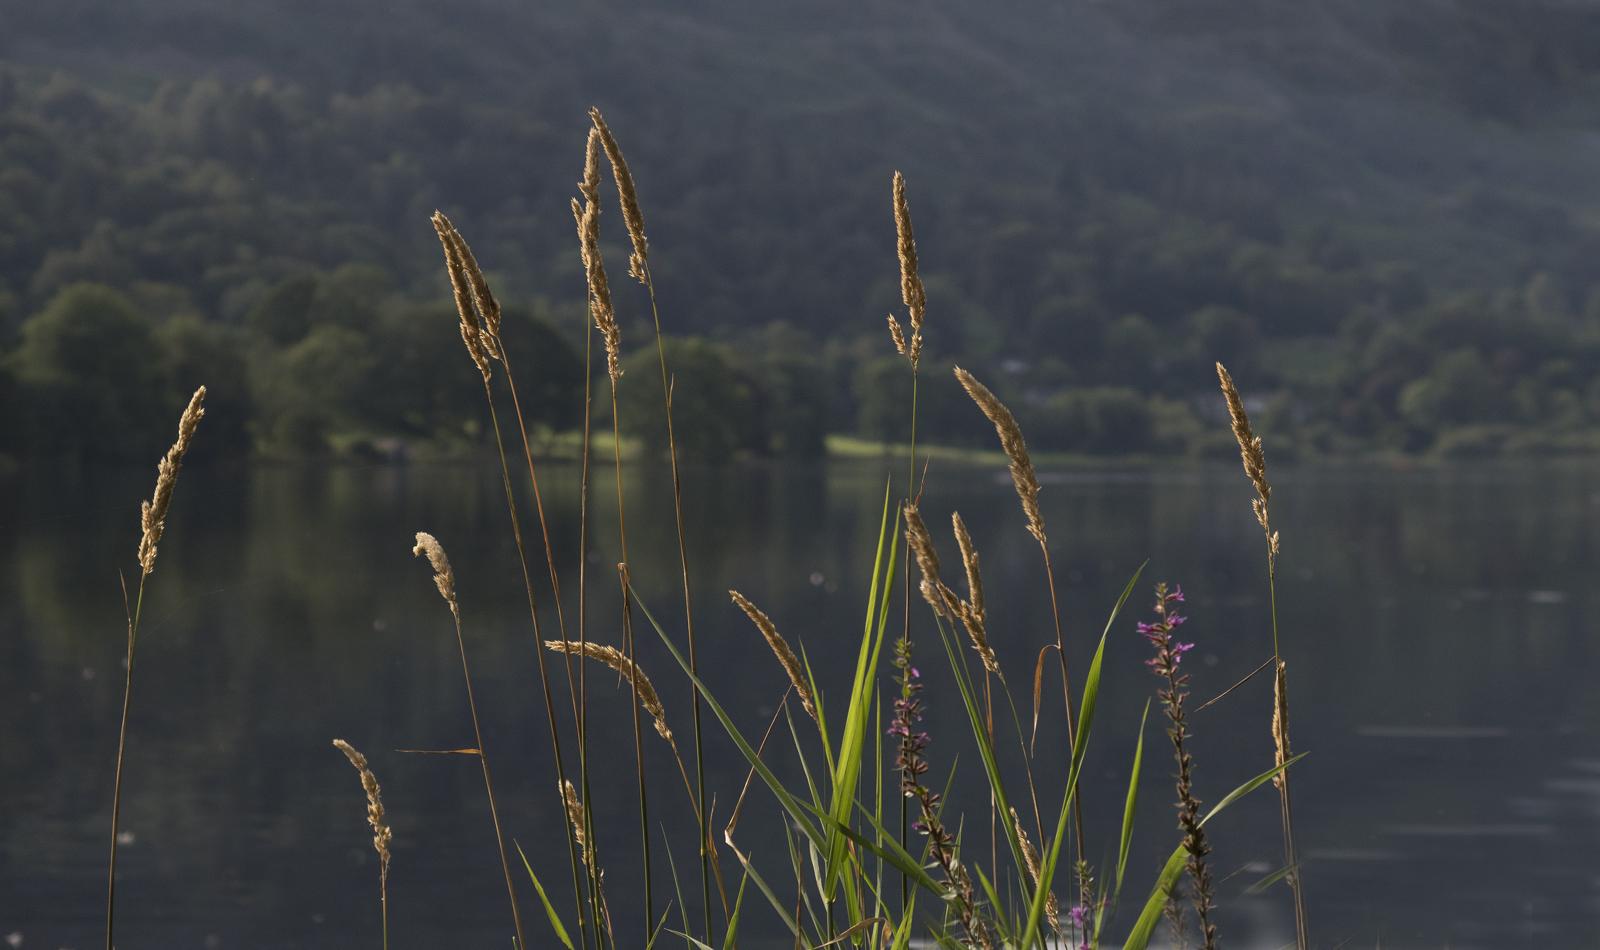 Grasmere Grasses